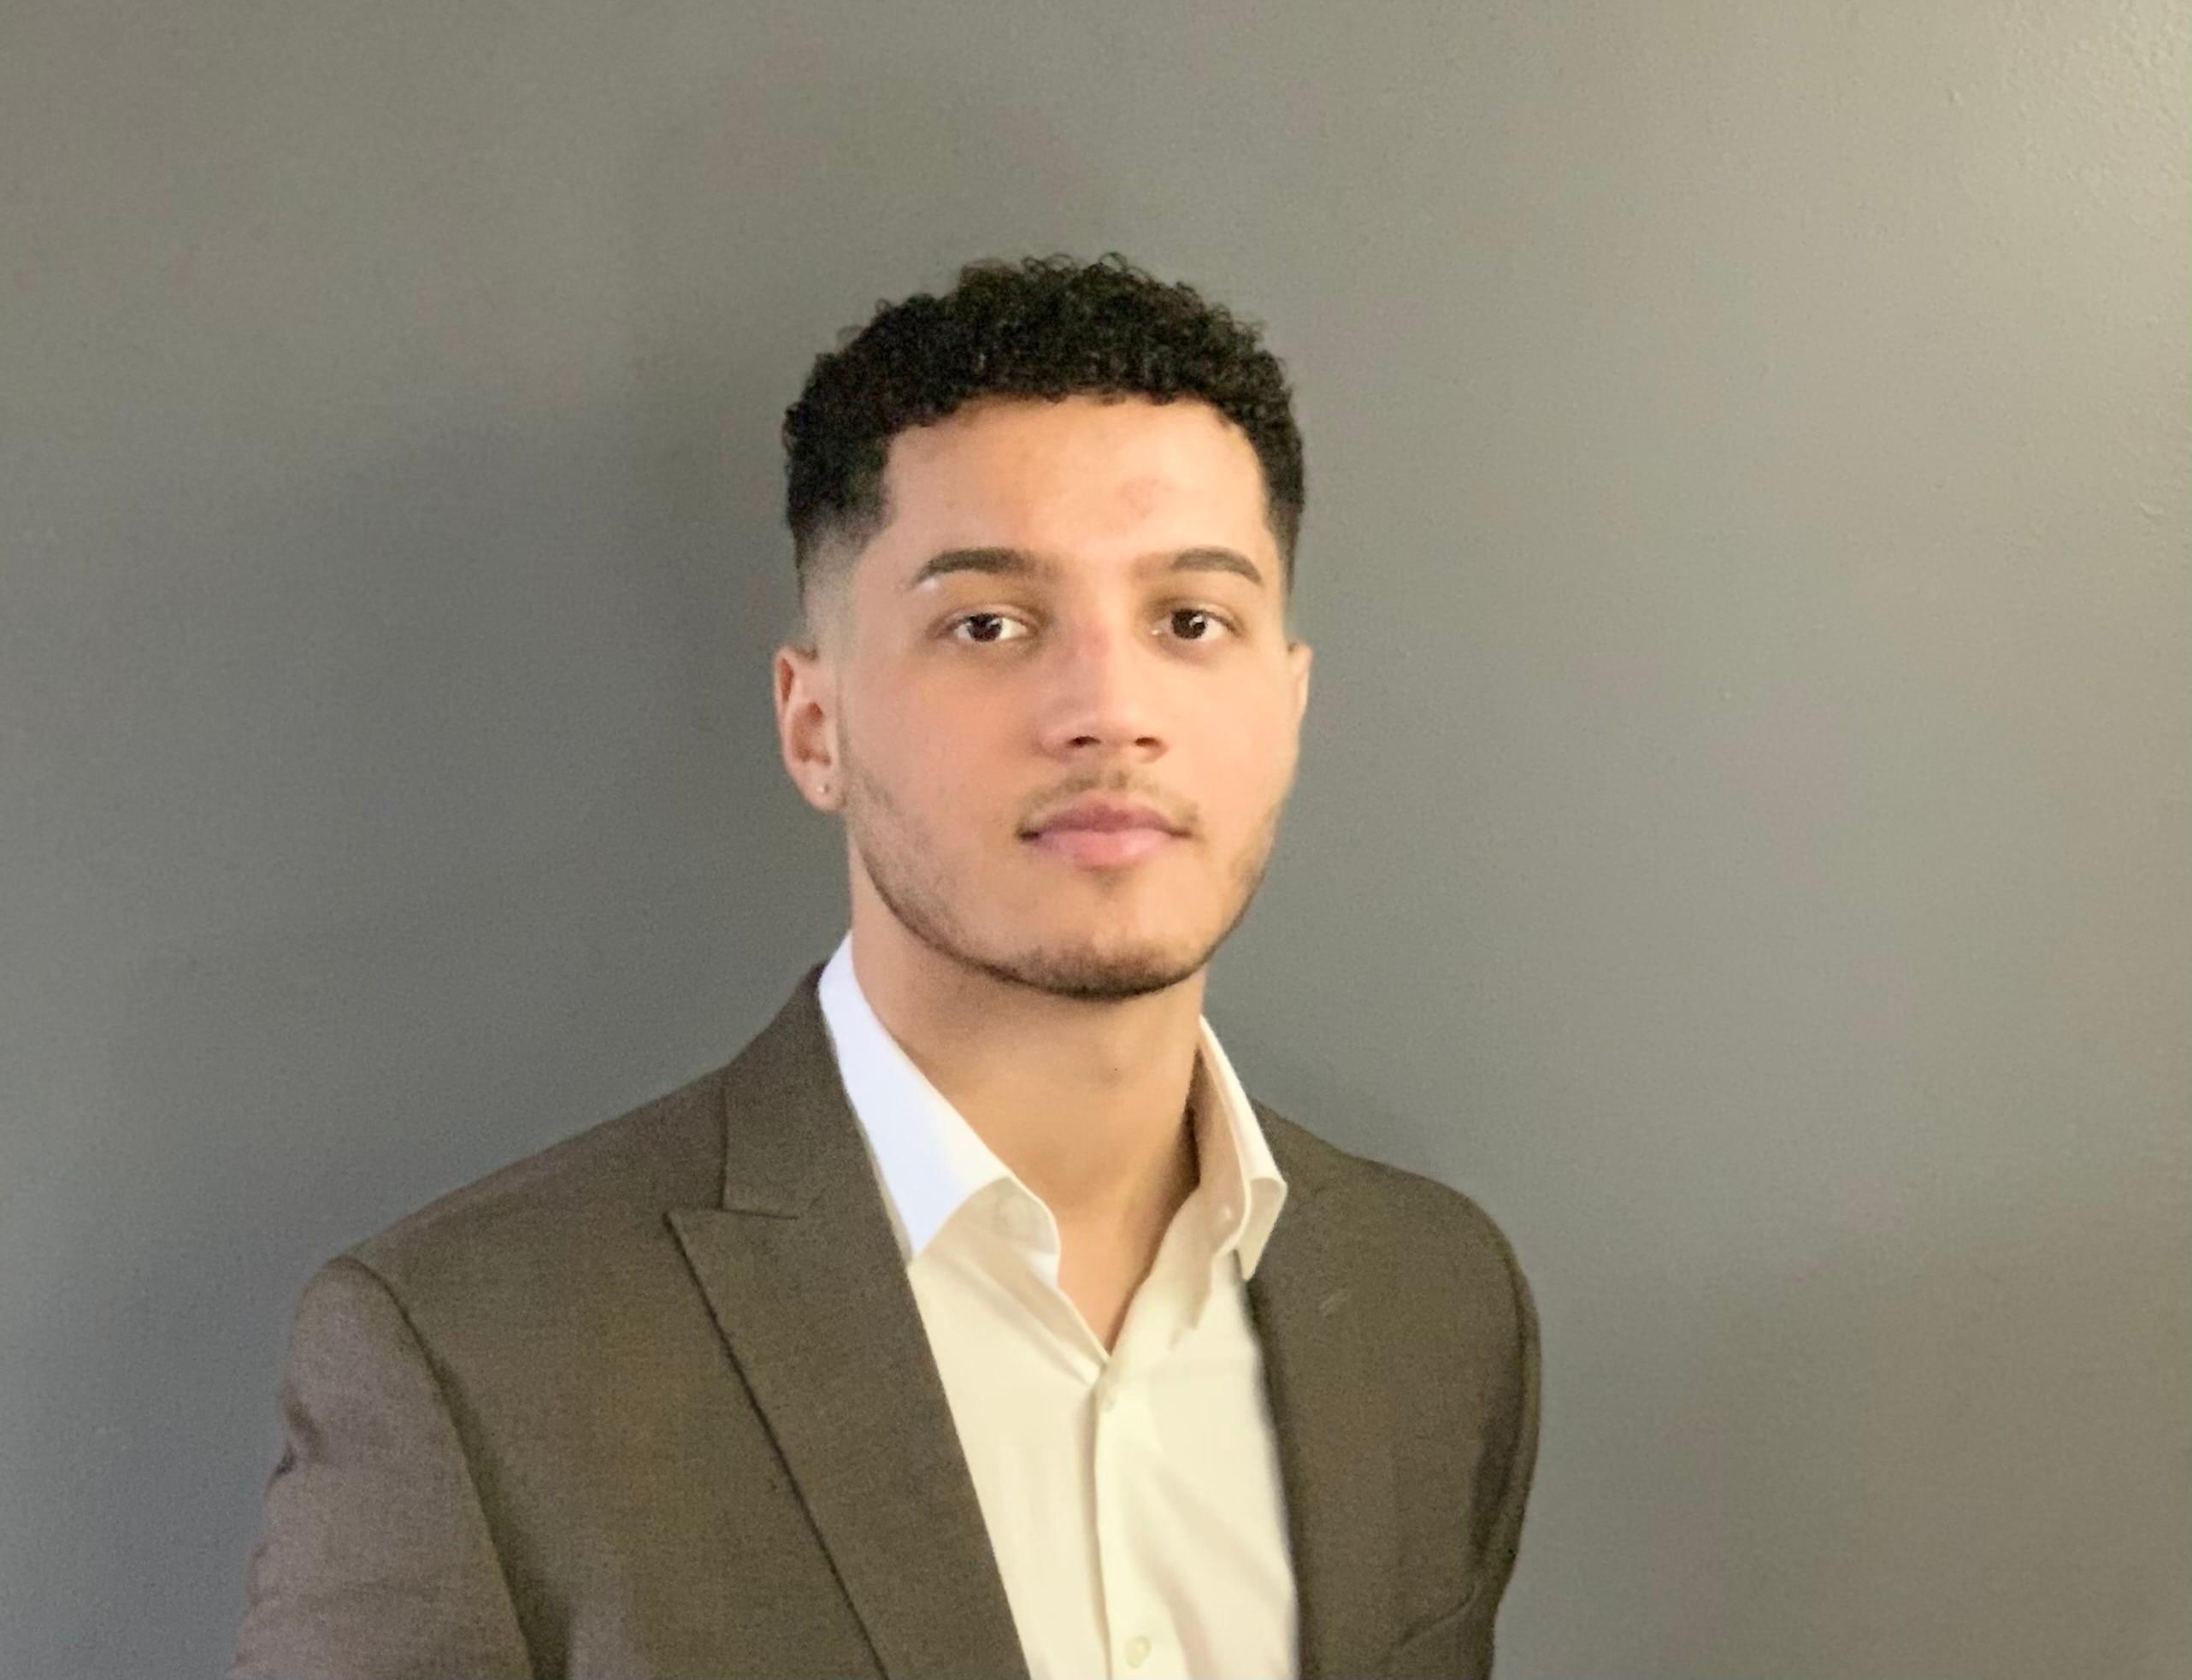 JEFFREY ARTILES Financial Professional & Insurance Agent